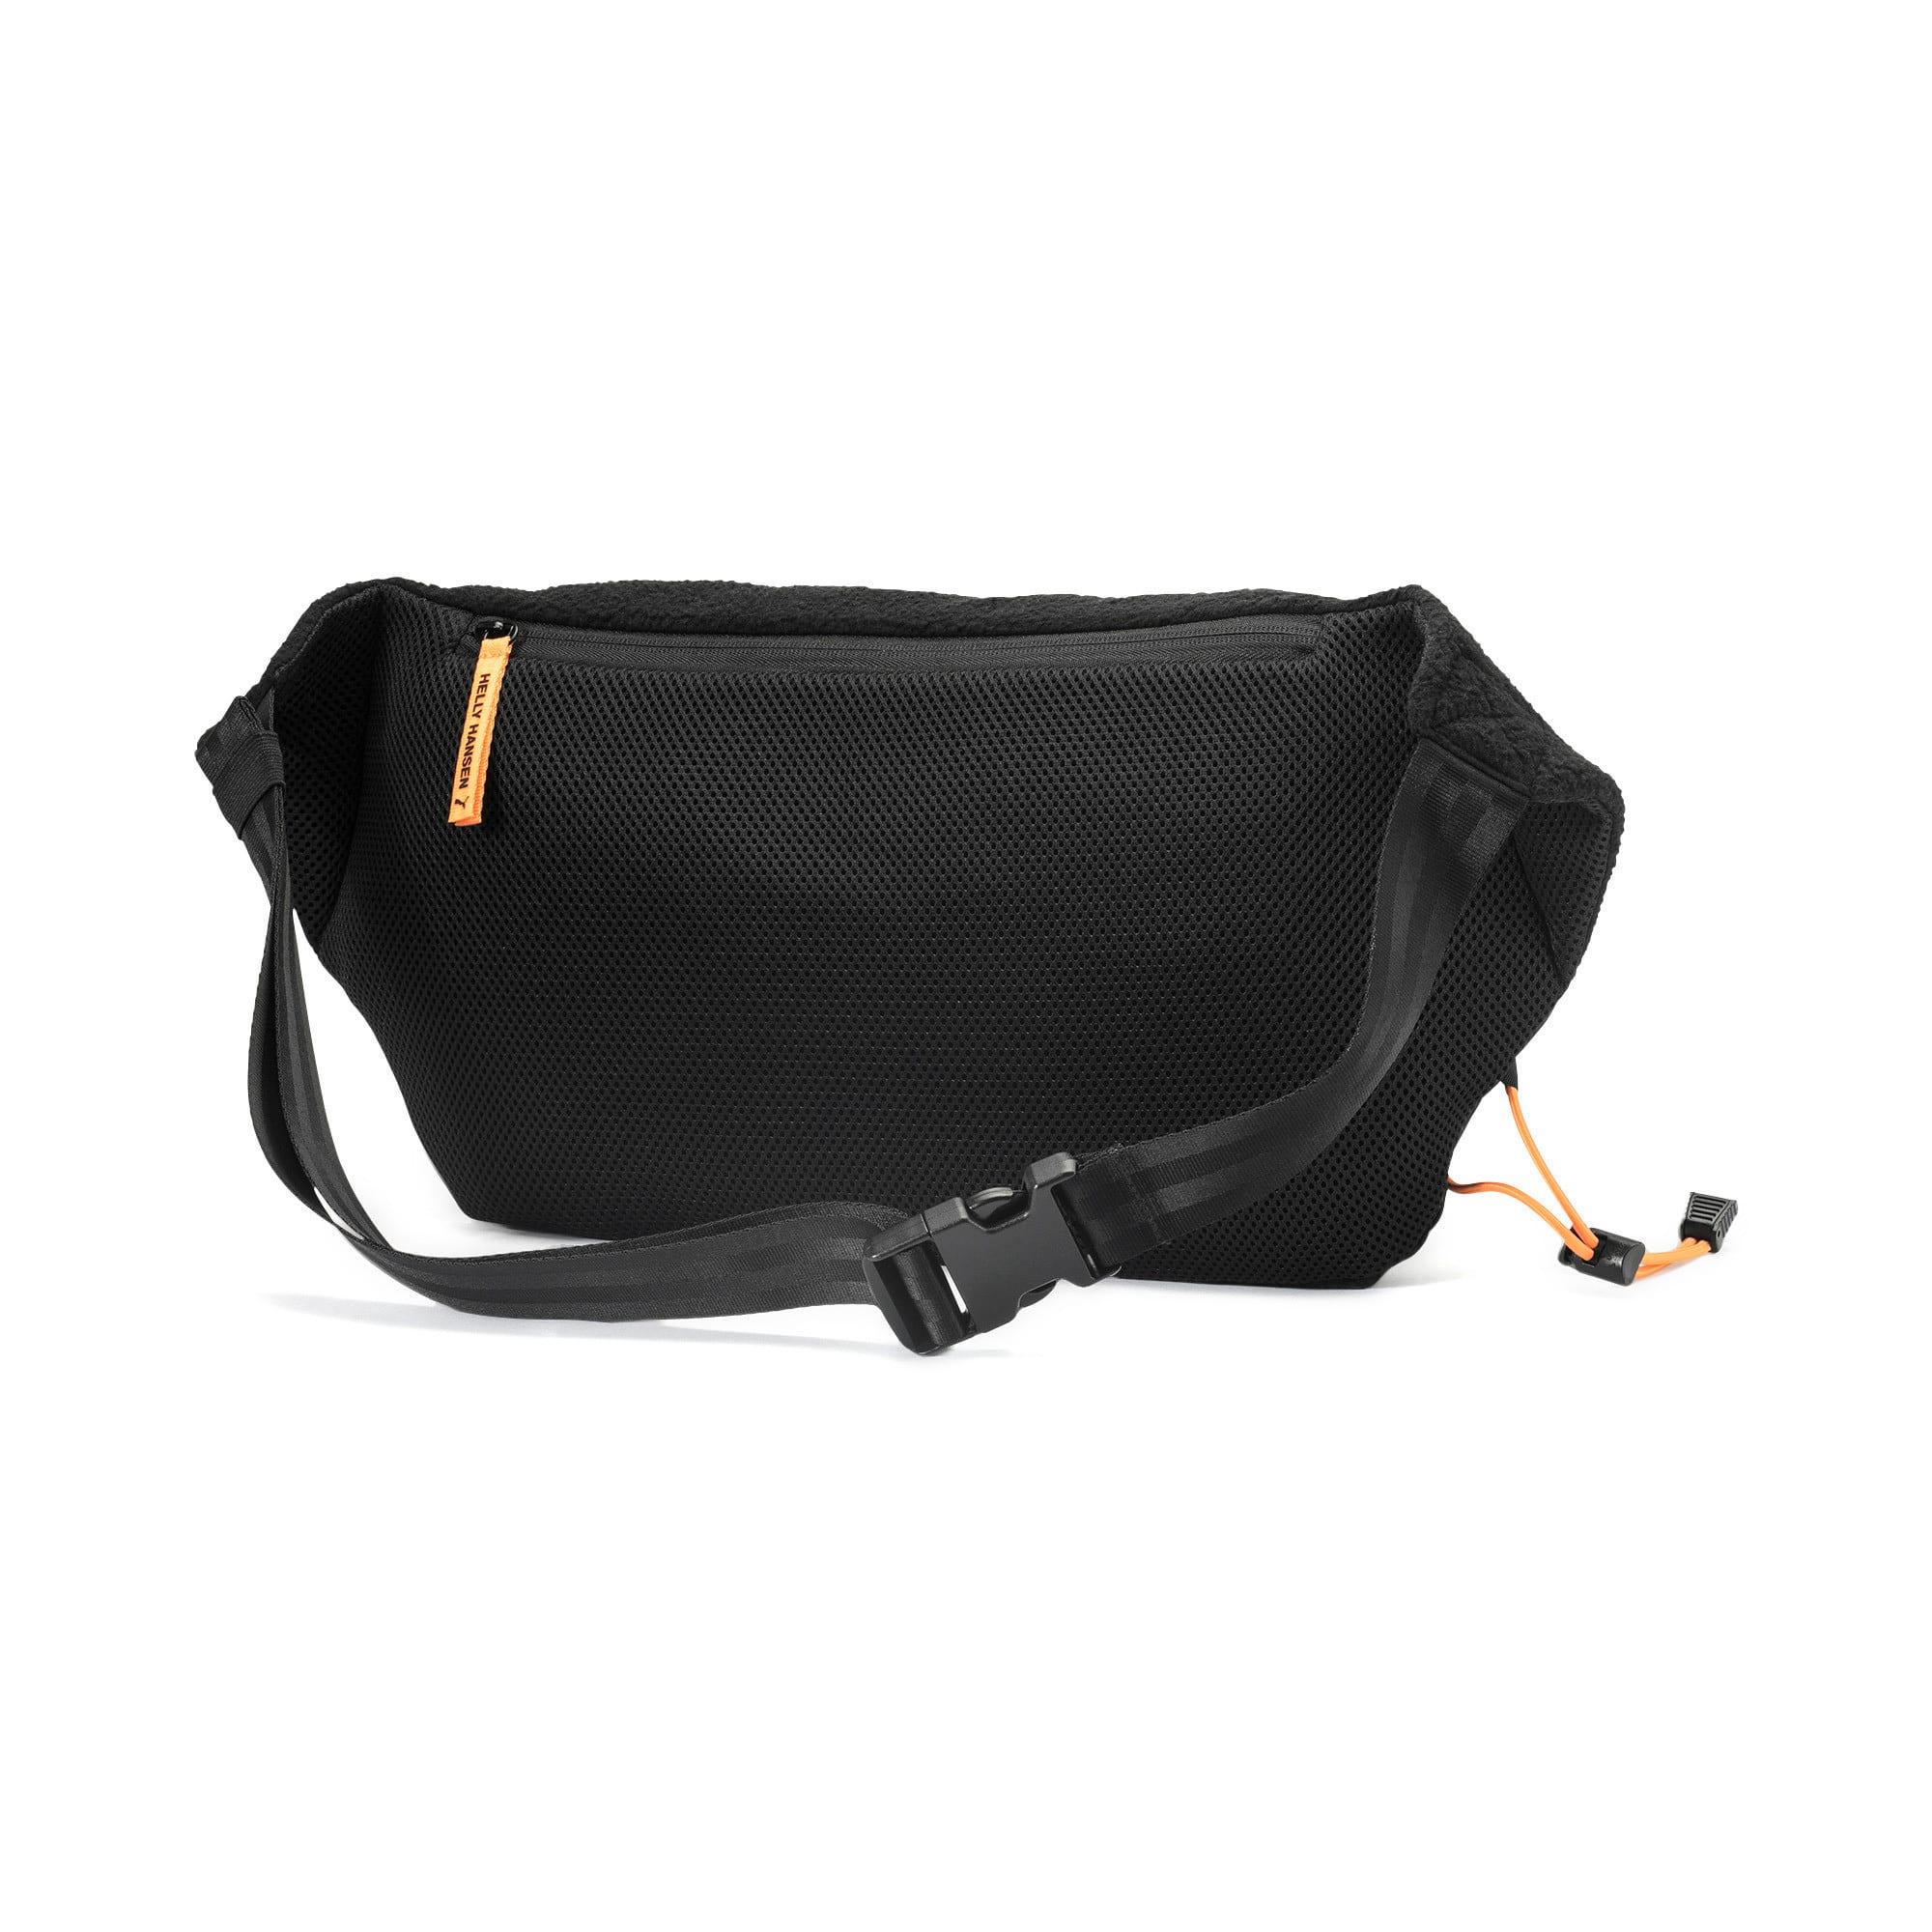 Thumbnail 2 of PUMA x HELLY HANSEN Oversized Waist Bag, Puma Black, medium